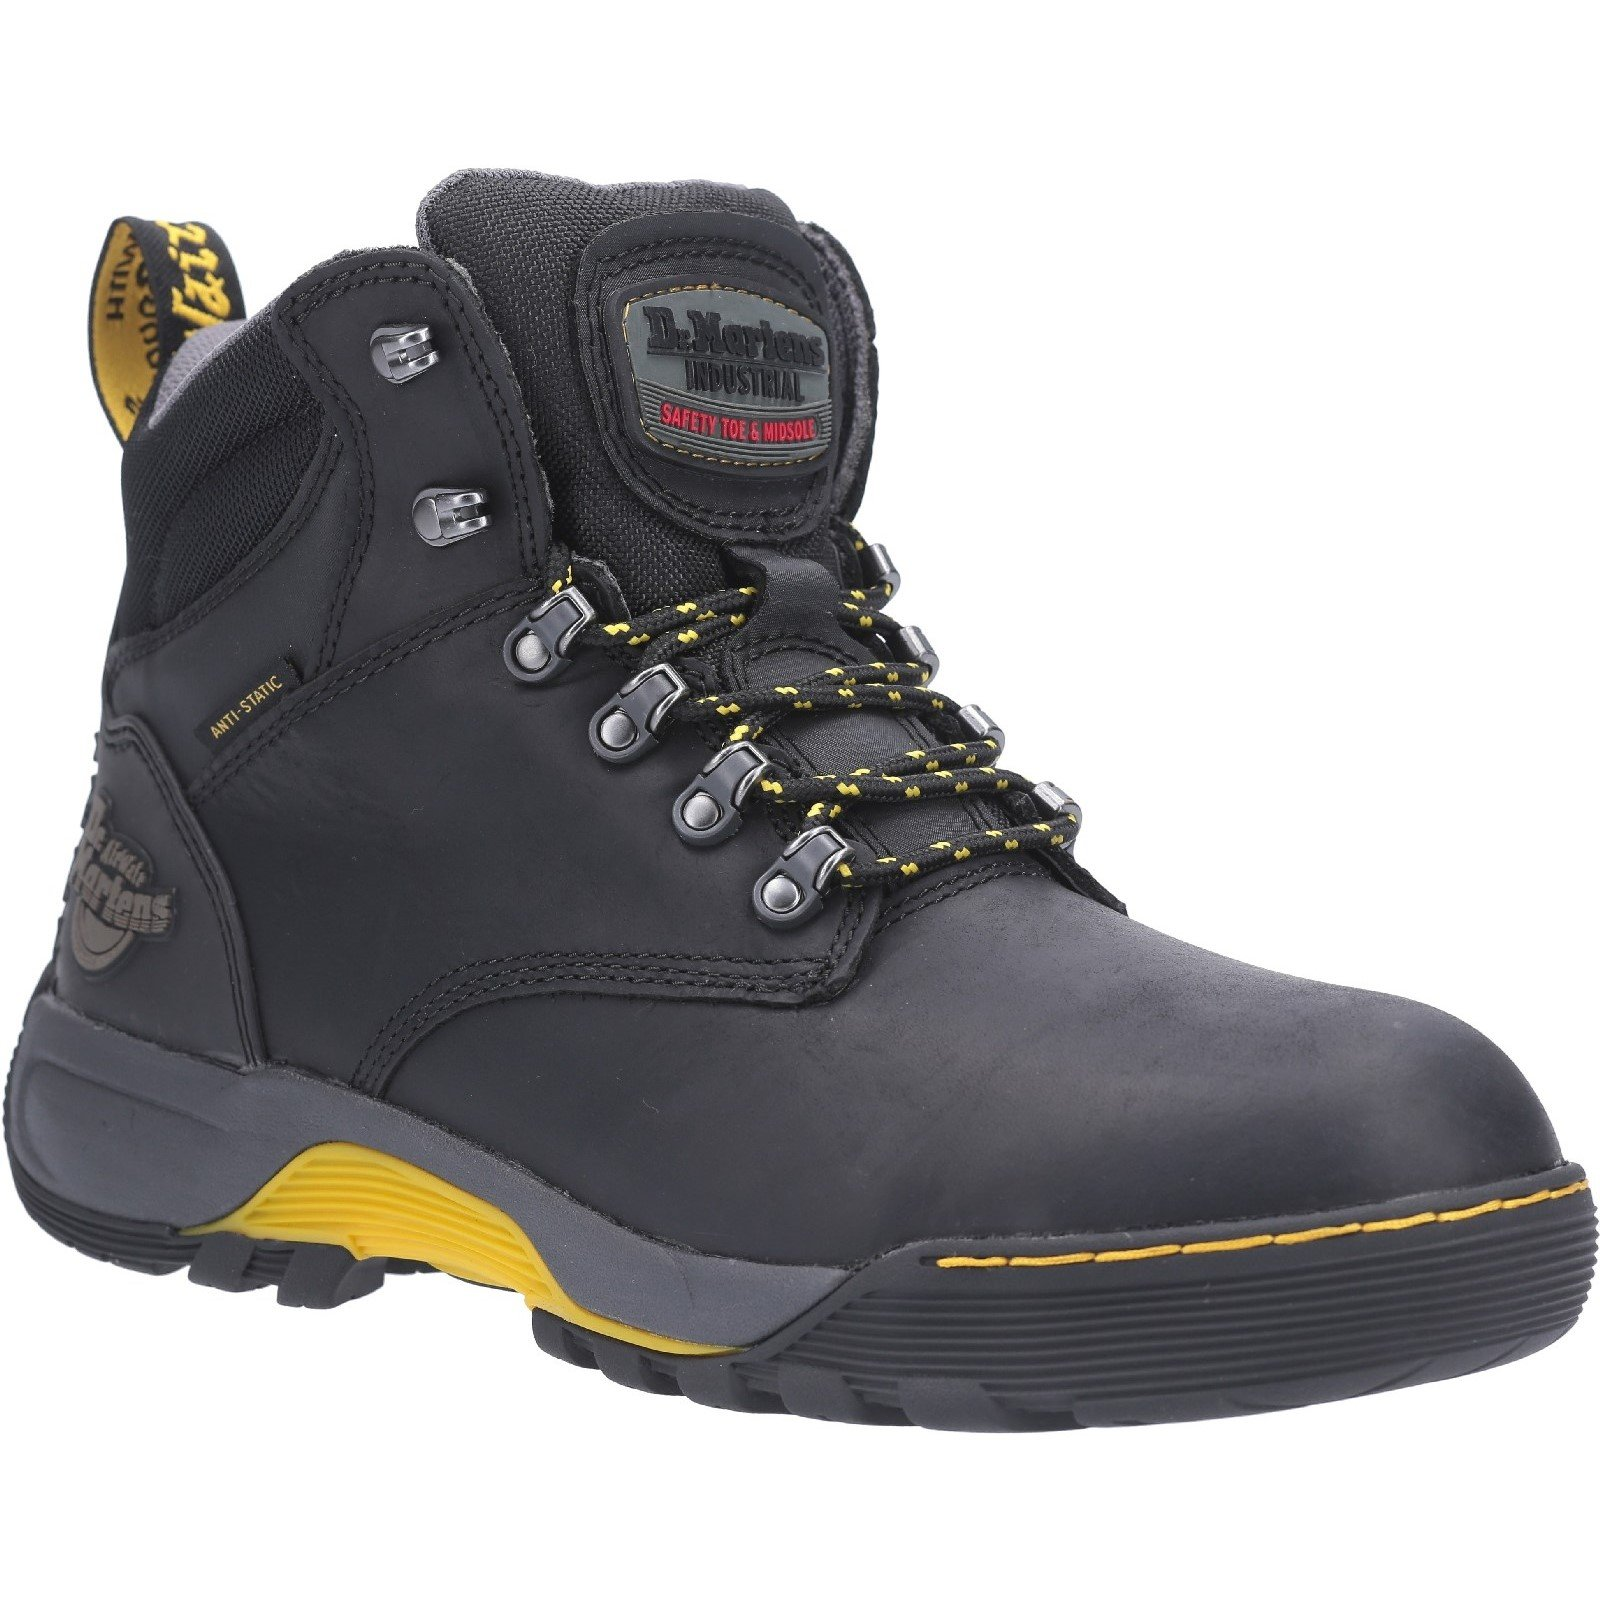 Dr Martens Unisex Ridge ST Lace Up Hiker Safety Boot Black 28324 - Black 8